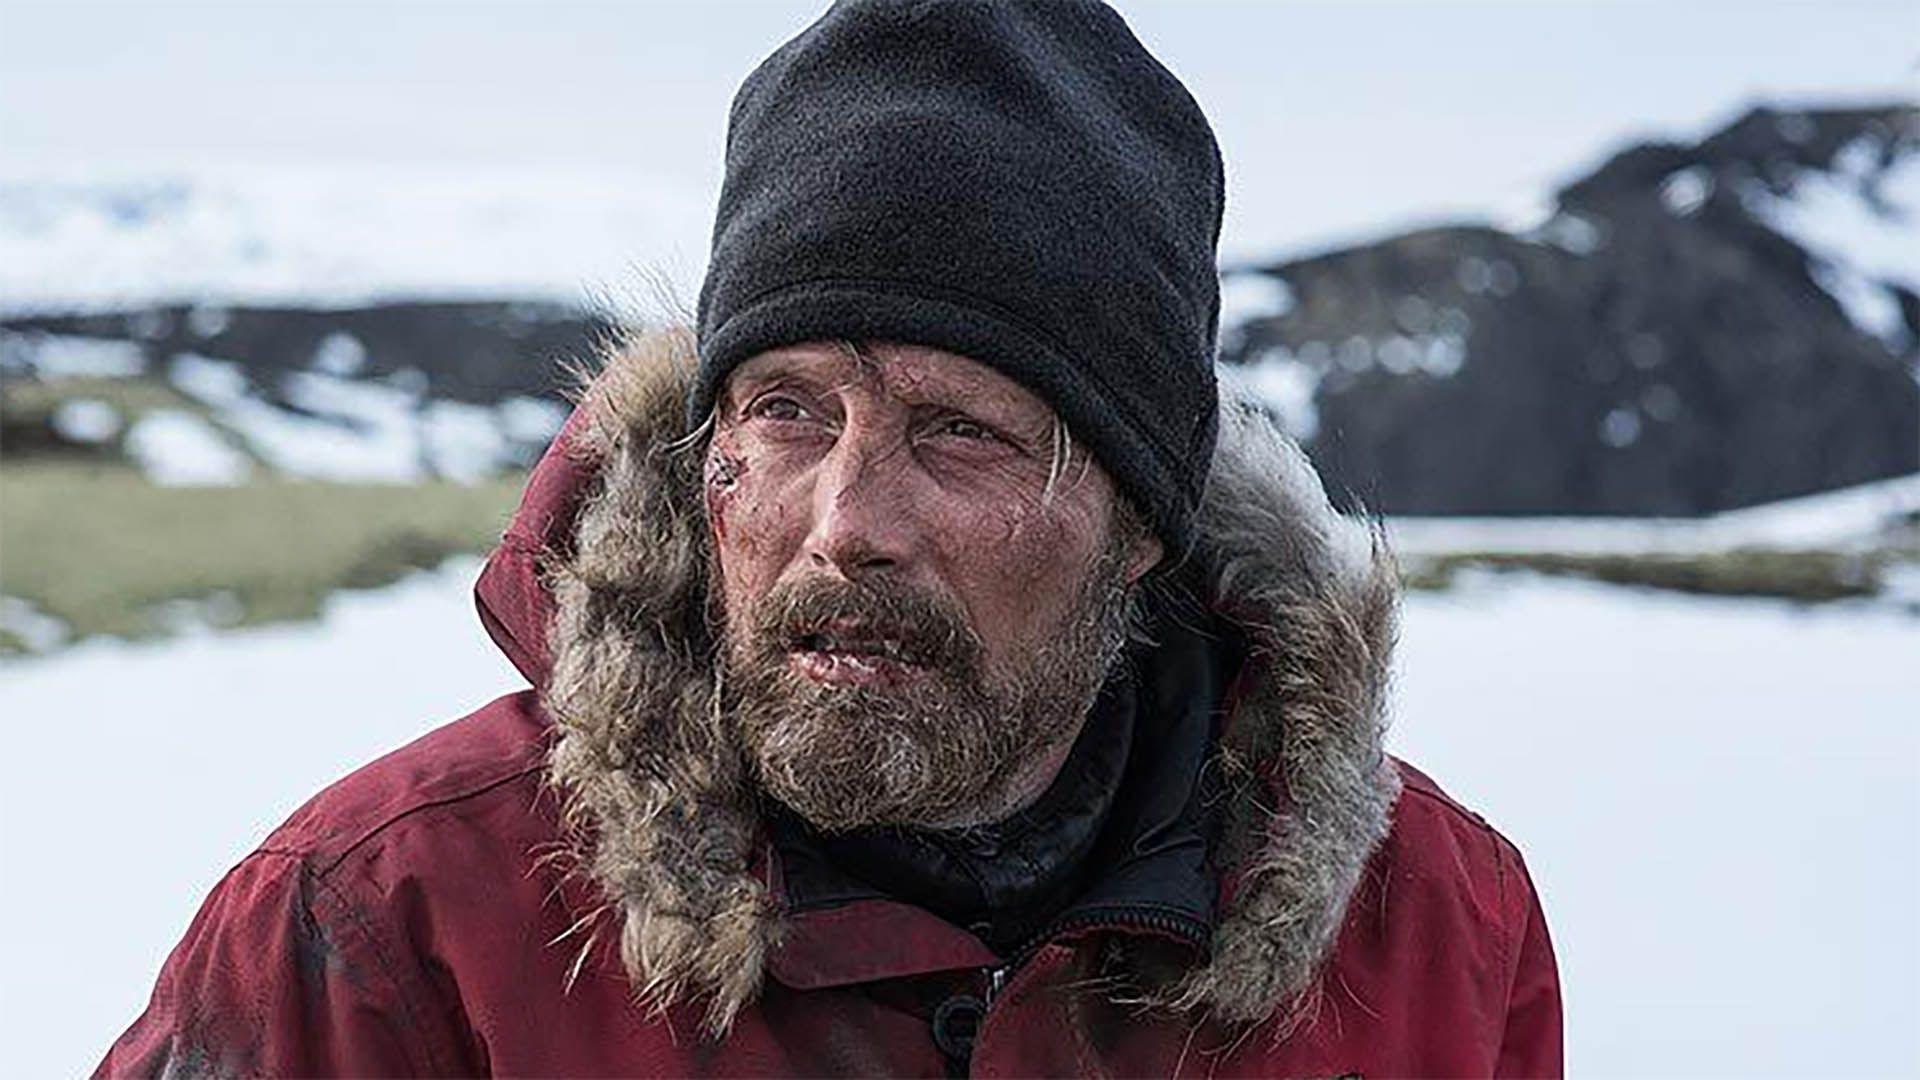 El Ártico es protagonizada por Mads Mikkelssen